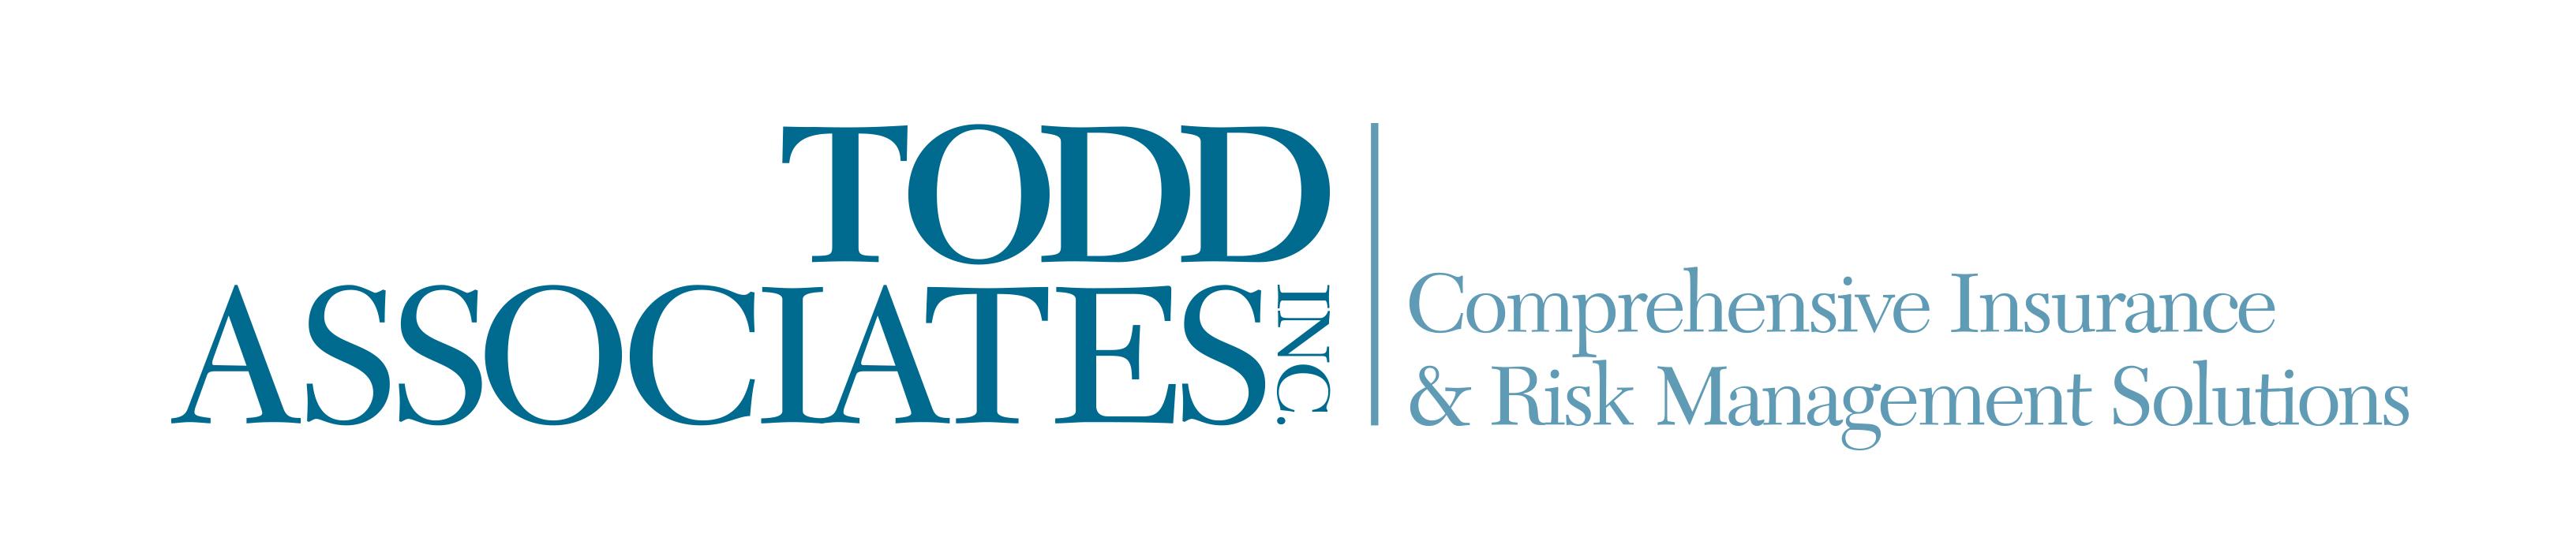 todd-associates-1